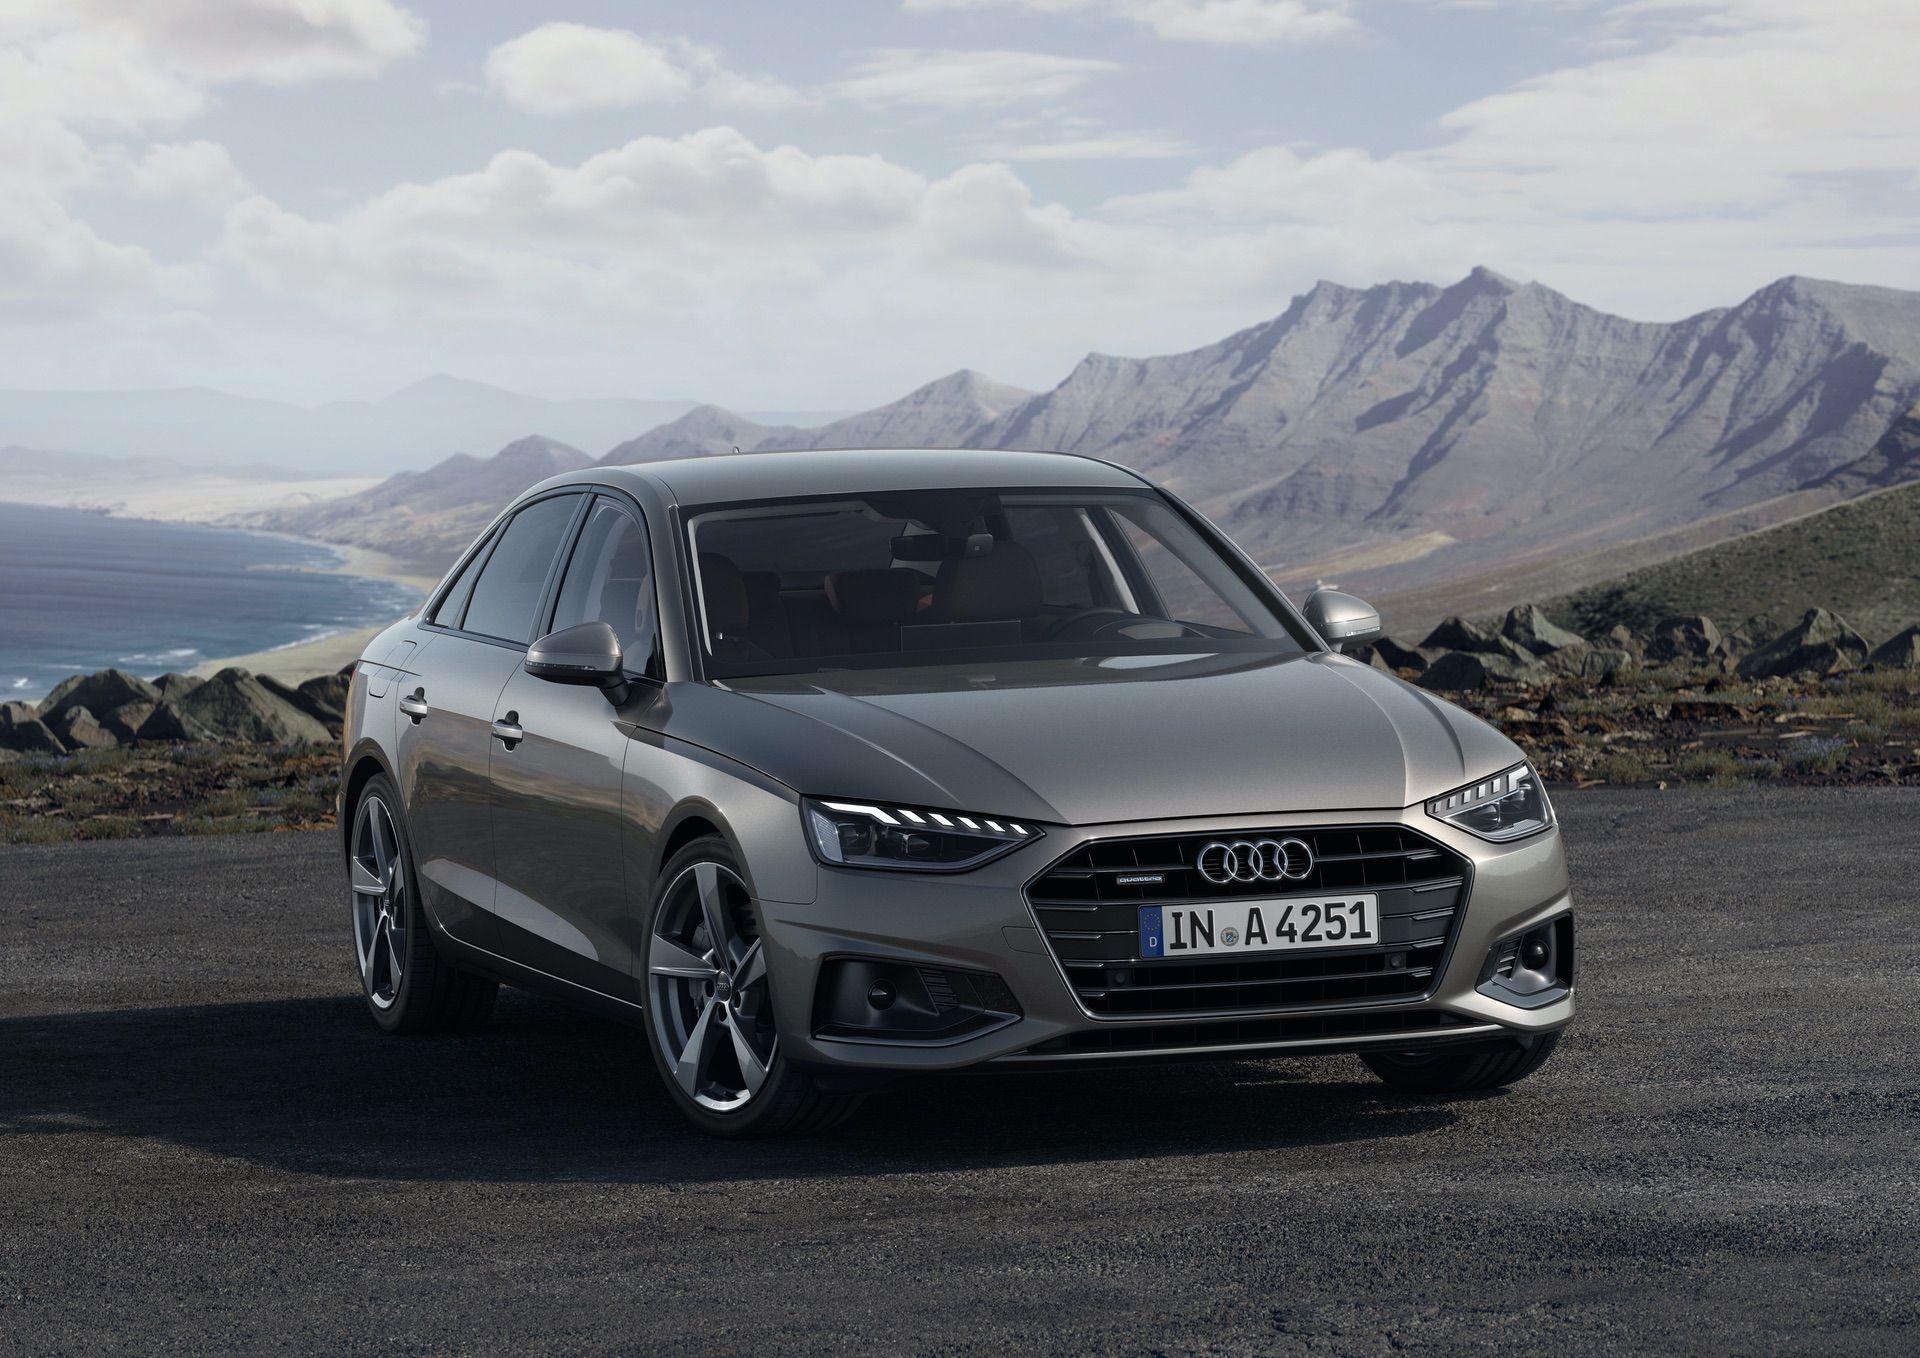 2020 Audi A4 sedan facelift 07